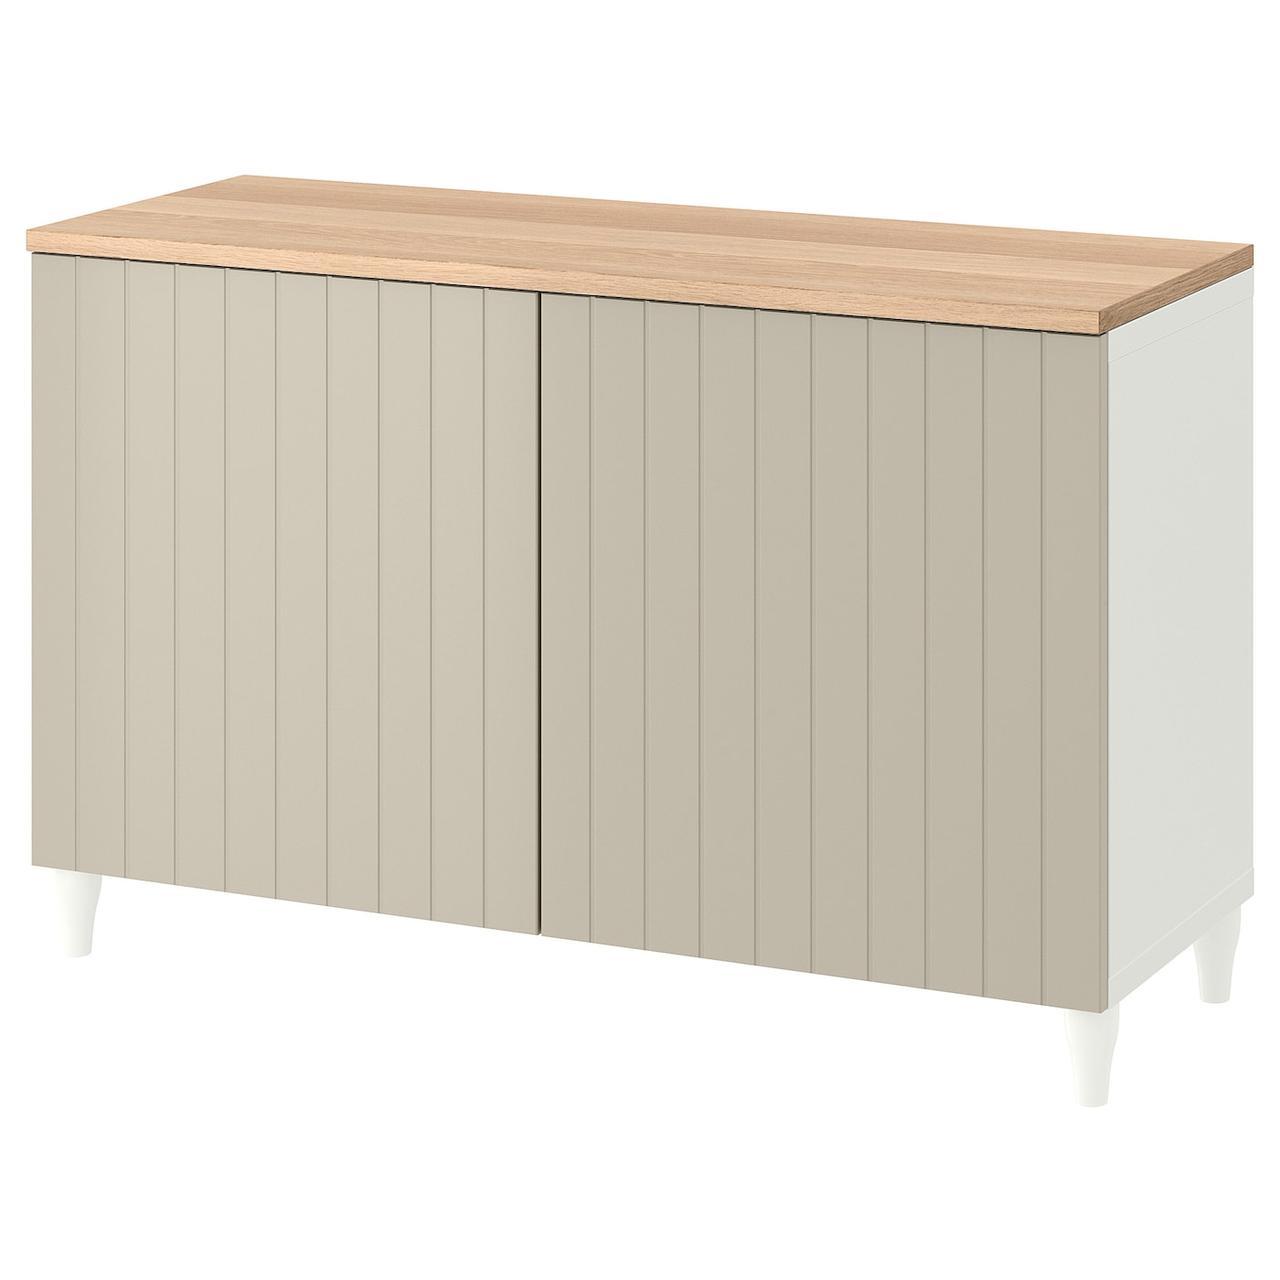 IKEA BESTÅ Комбінація з дверцятами білий/Sutterviken/Kabbarp szarobeżowy 120x42x76 см